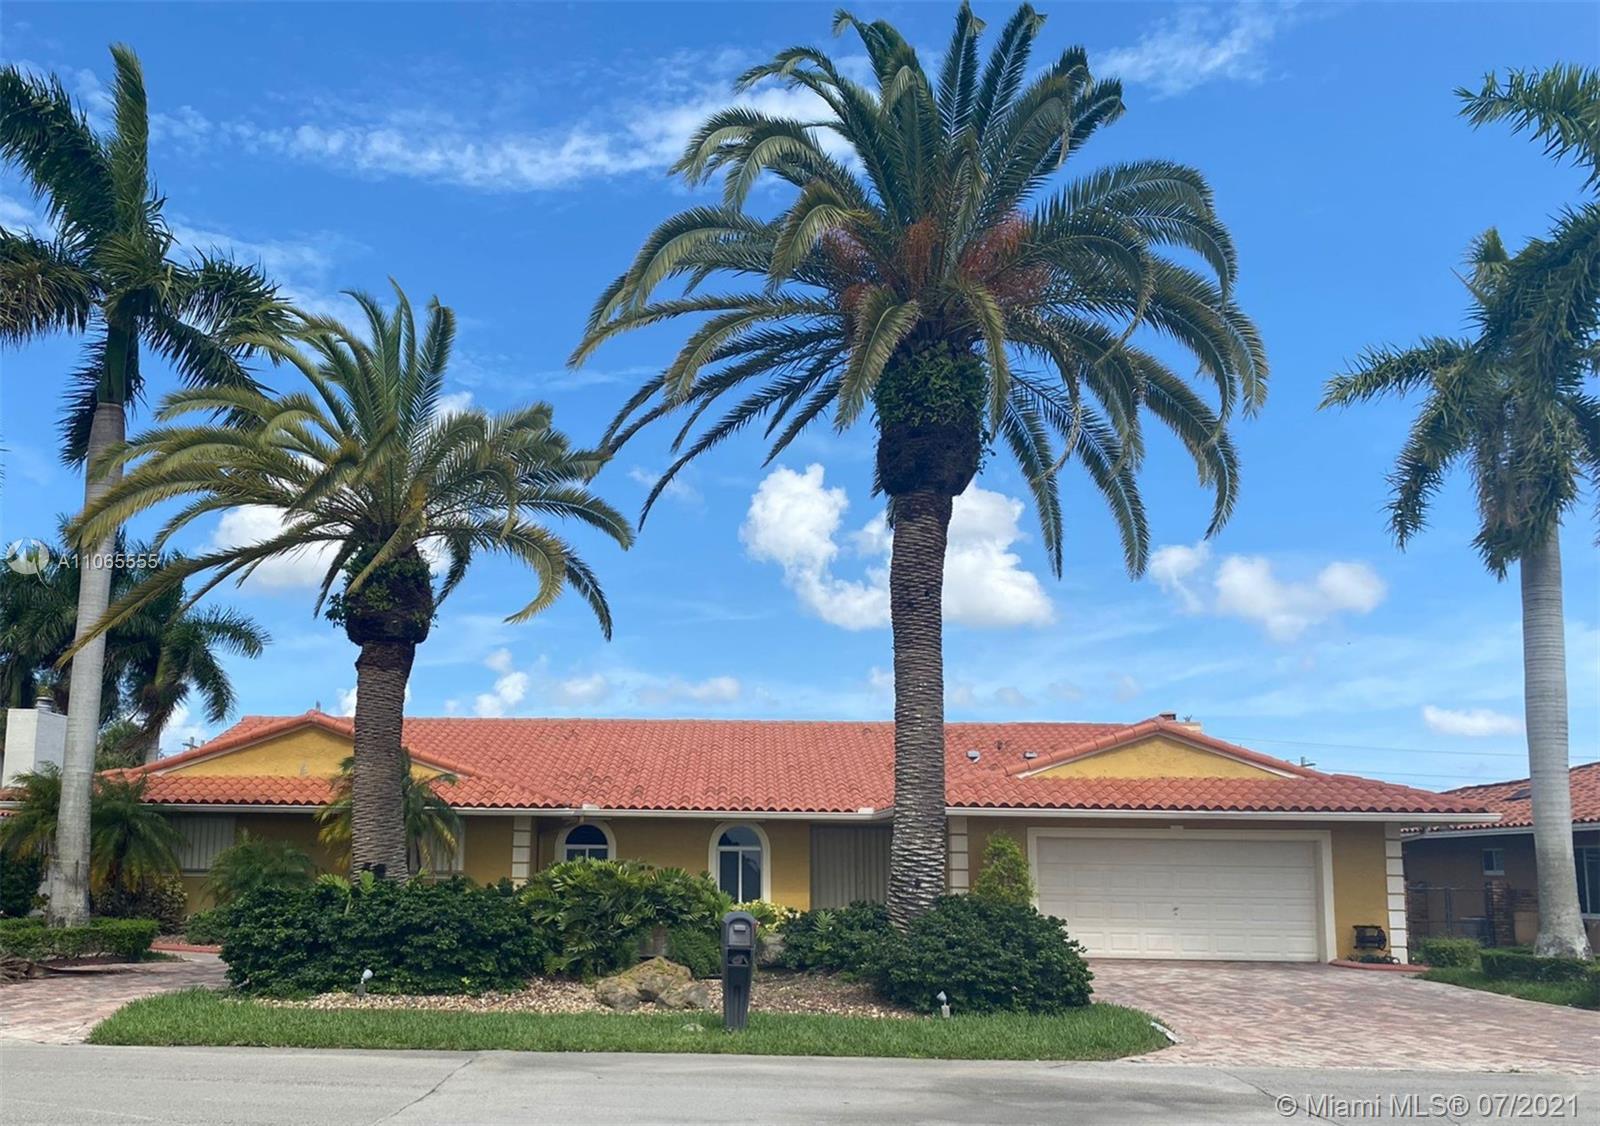 Country Club Of Miam - 19721 E Oakmont Dr, Hialeah, FL 33015